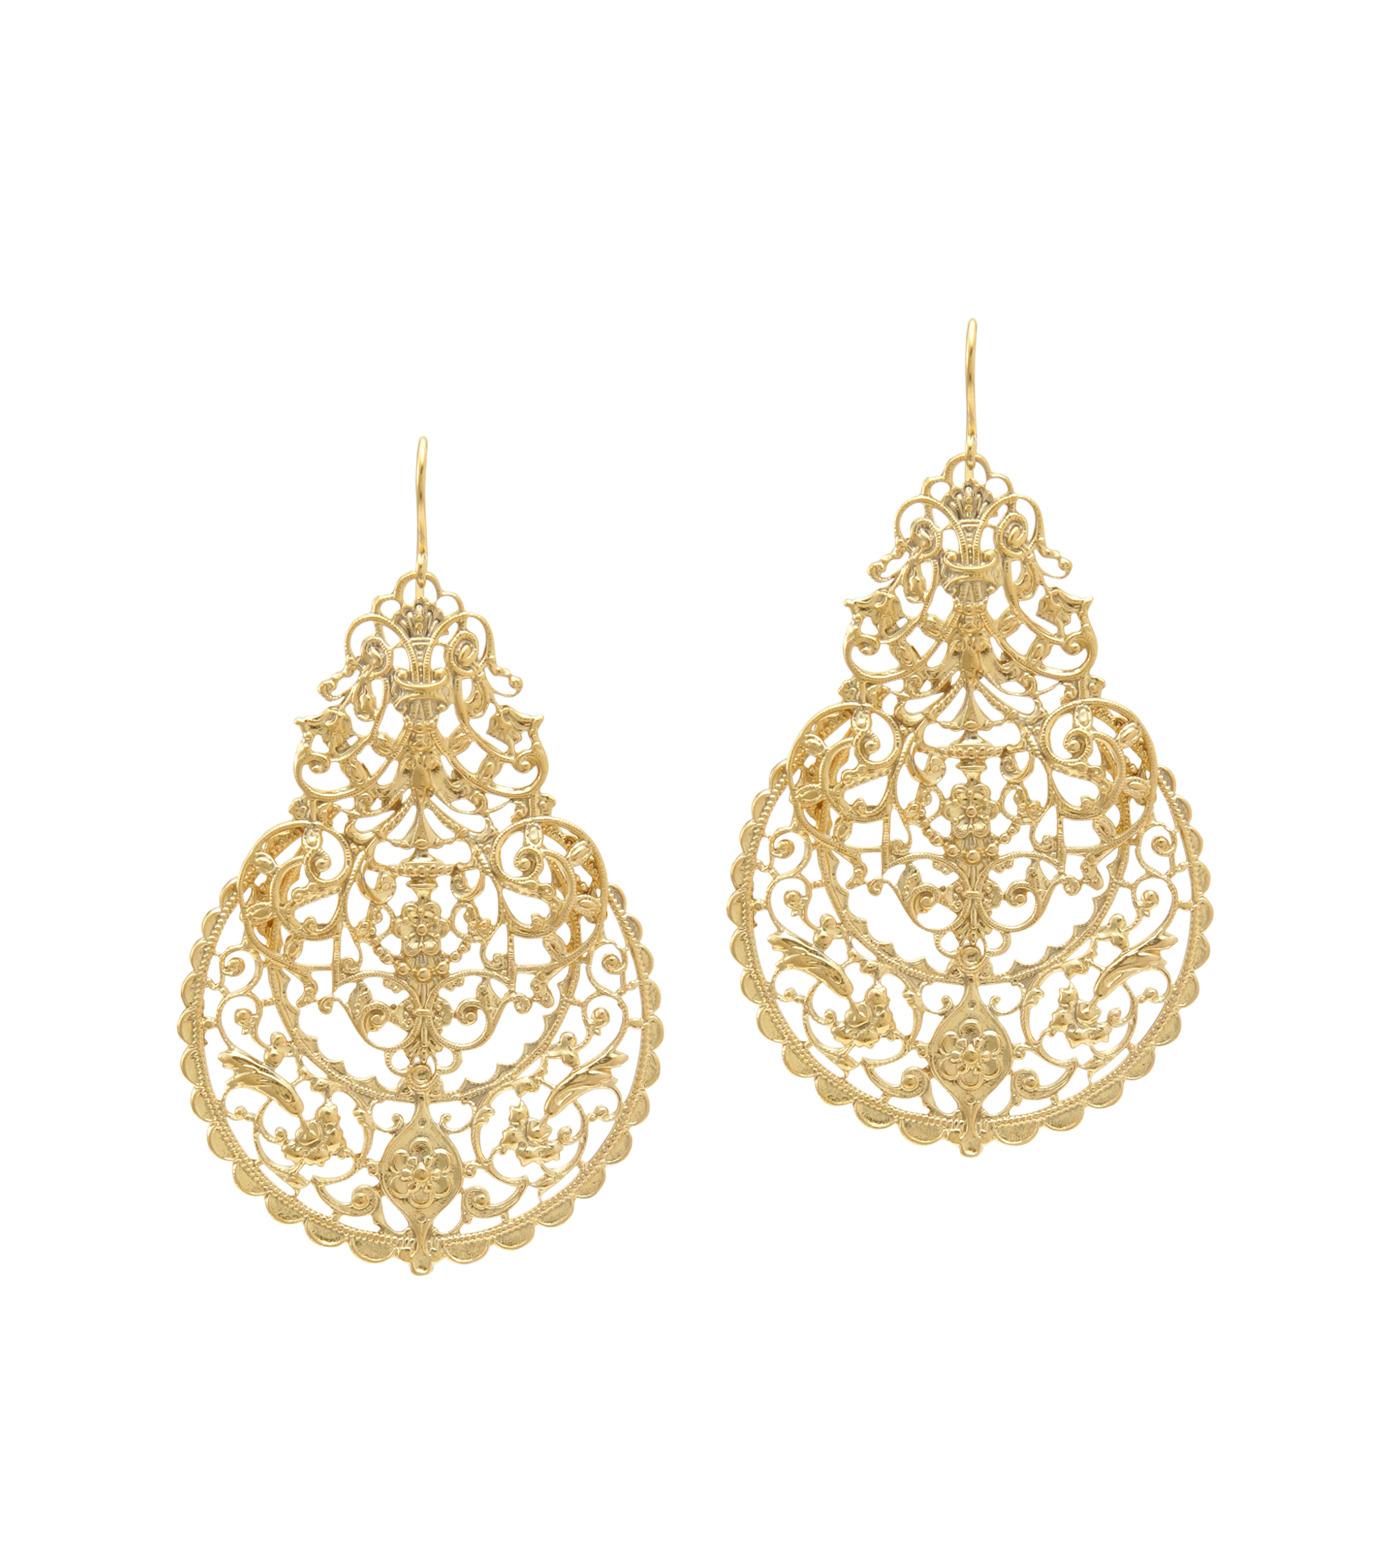 I AM by Ileana Makri(アイ アム バイ イリーナ マクリ)のAntoinette Earrings-GOLD-O489-42-099-2 拡大詳細画像1